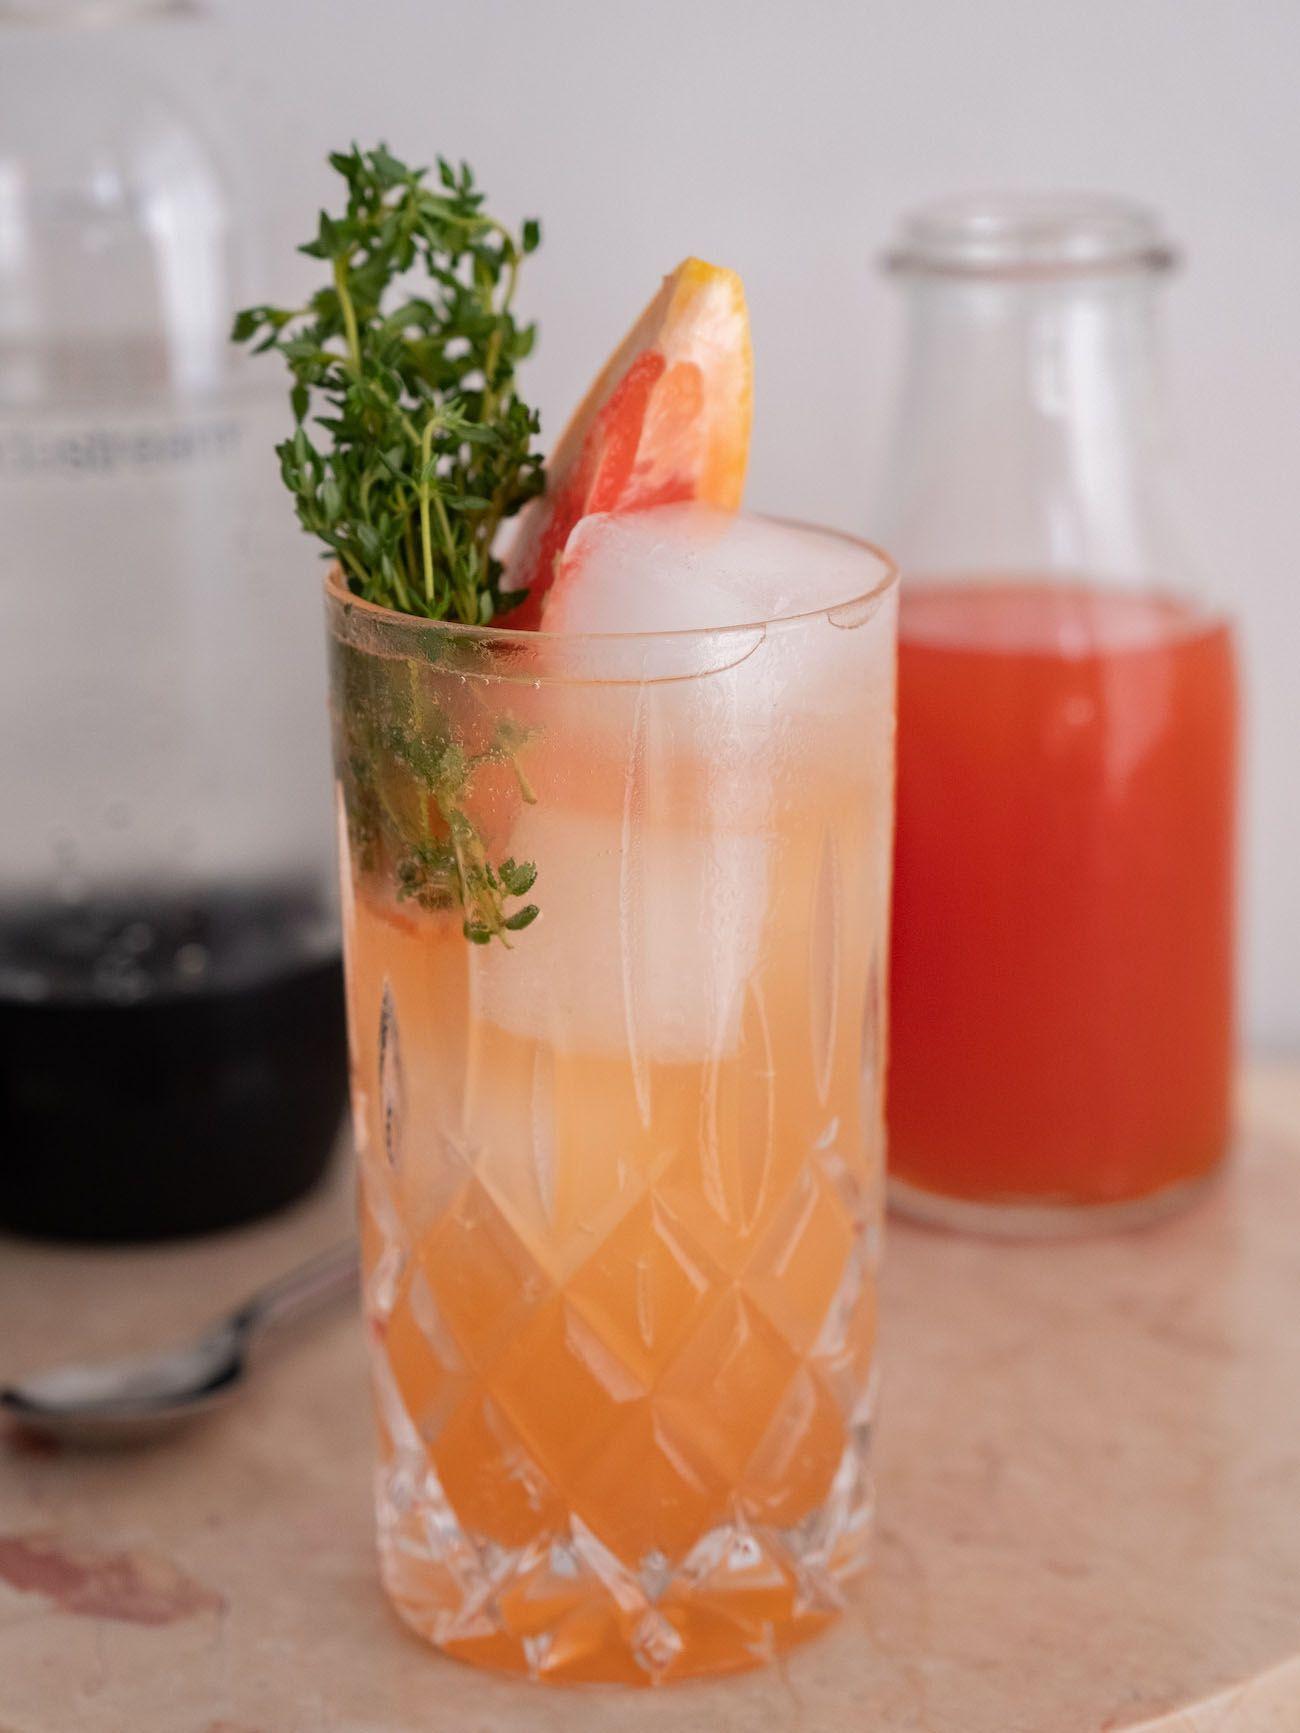 Foodblog, About Fuel, Soda Stream, Sirup, Rezept, Pink Grapefruit mit Thymian, Eiswürfel, Löffel